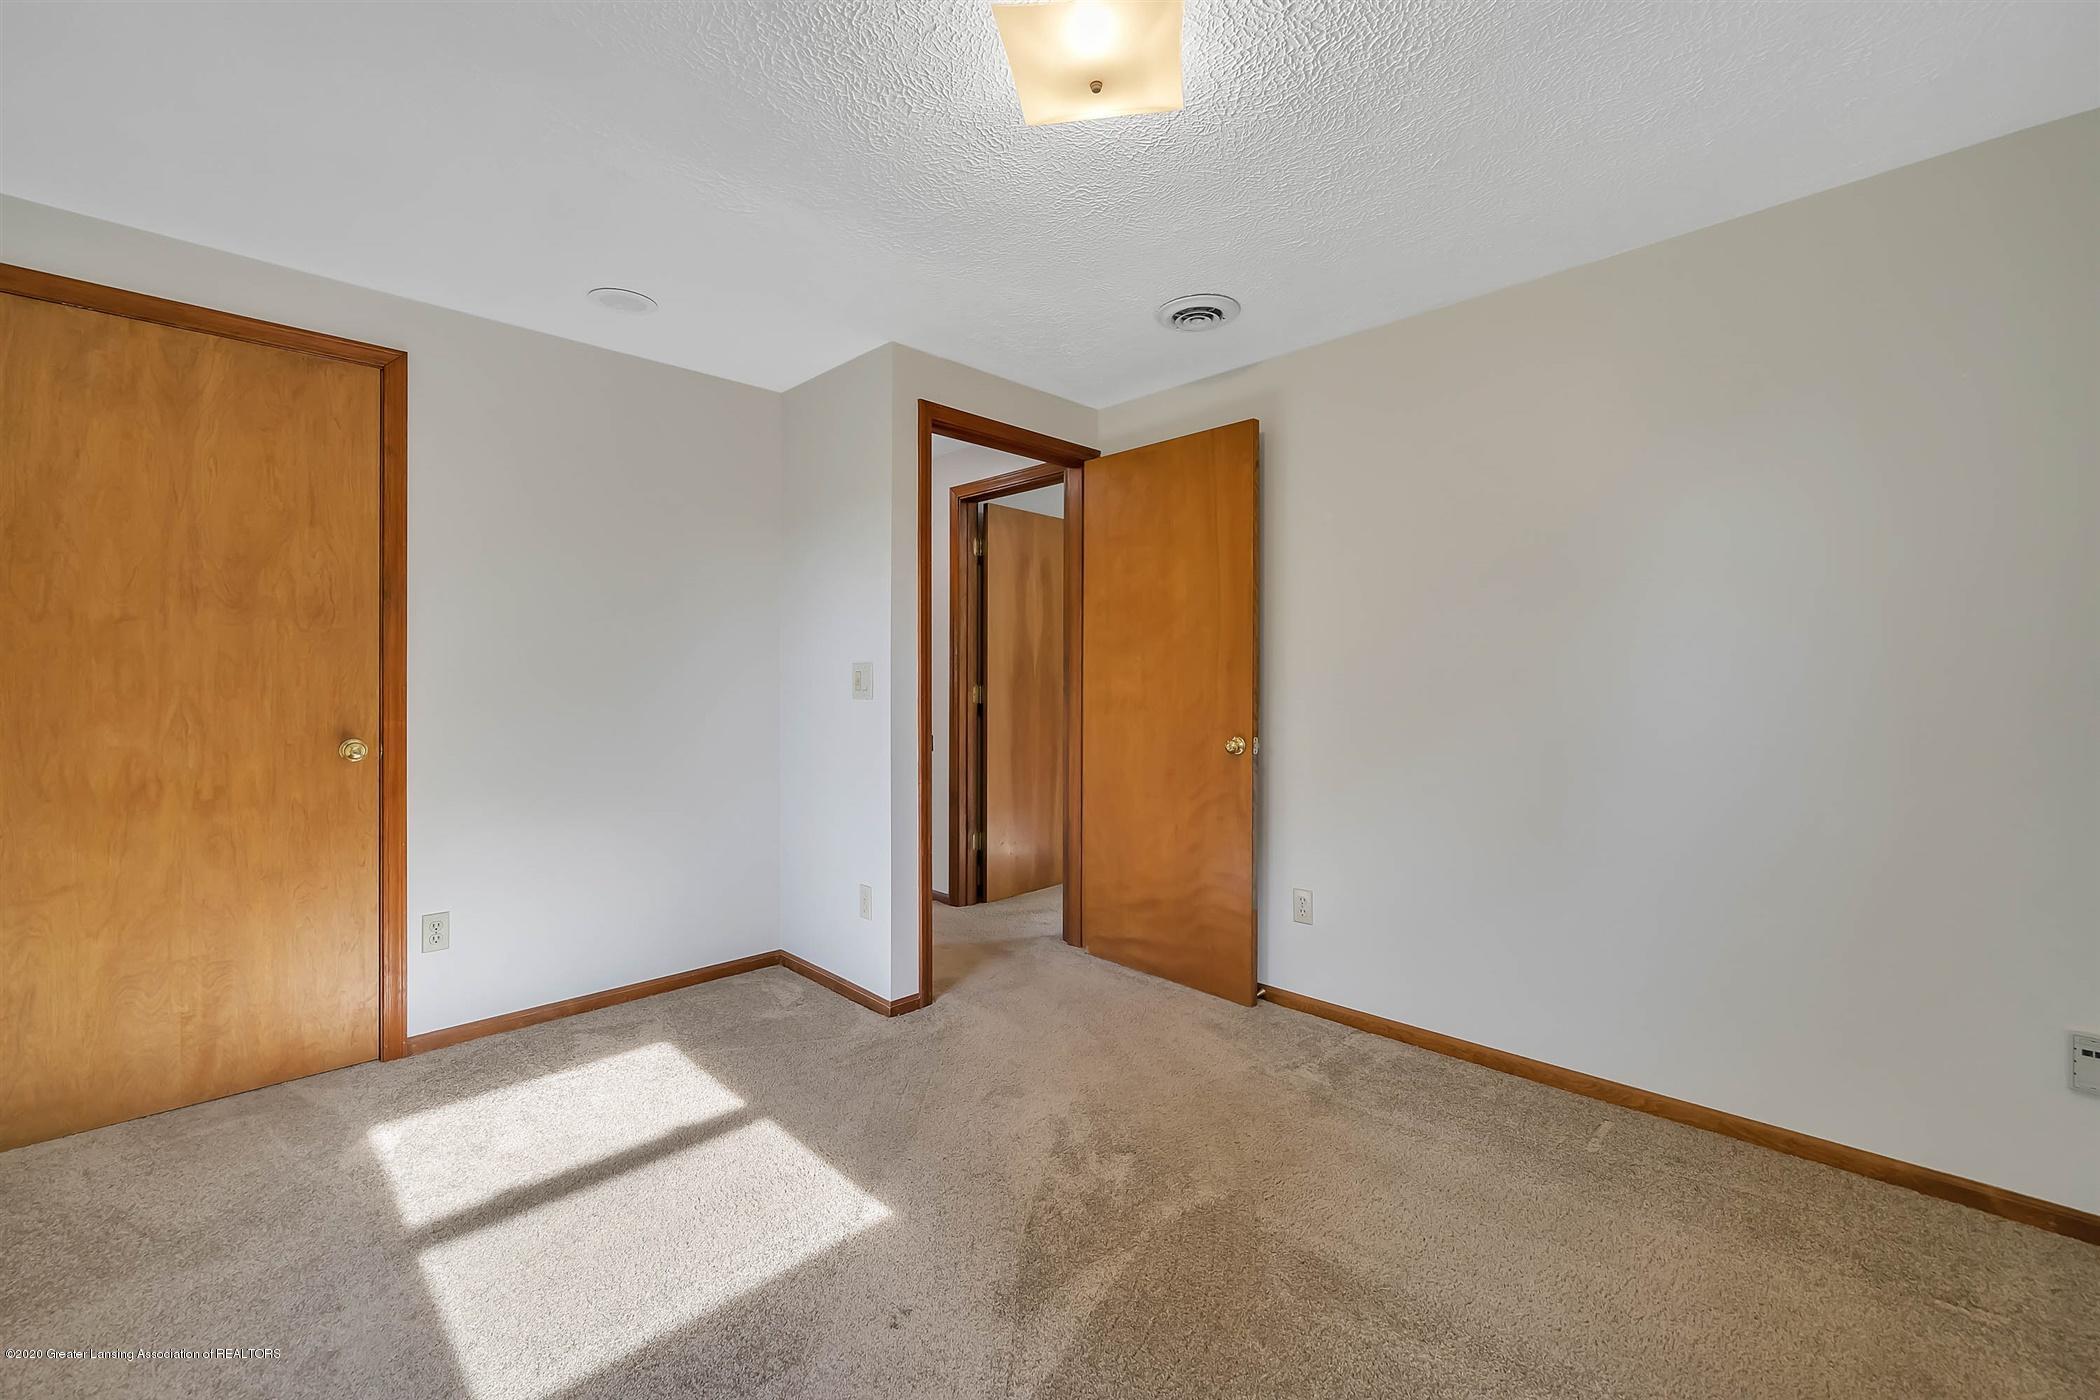 6750 W Lovejoy Rd - (15) 6750 Lovejoy Bedroom 2 - 15